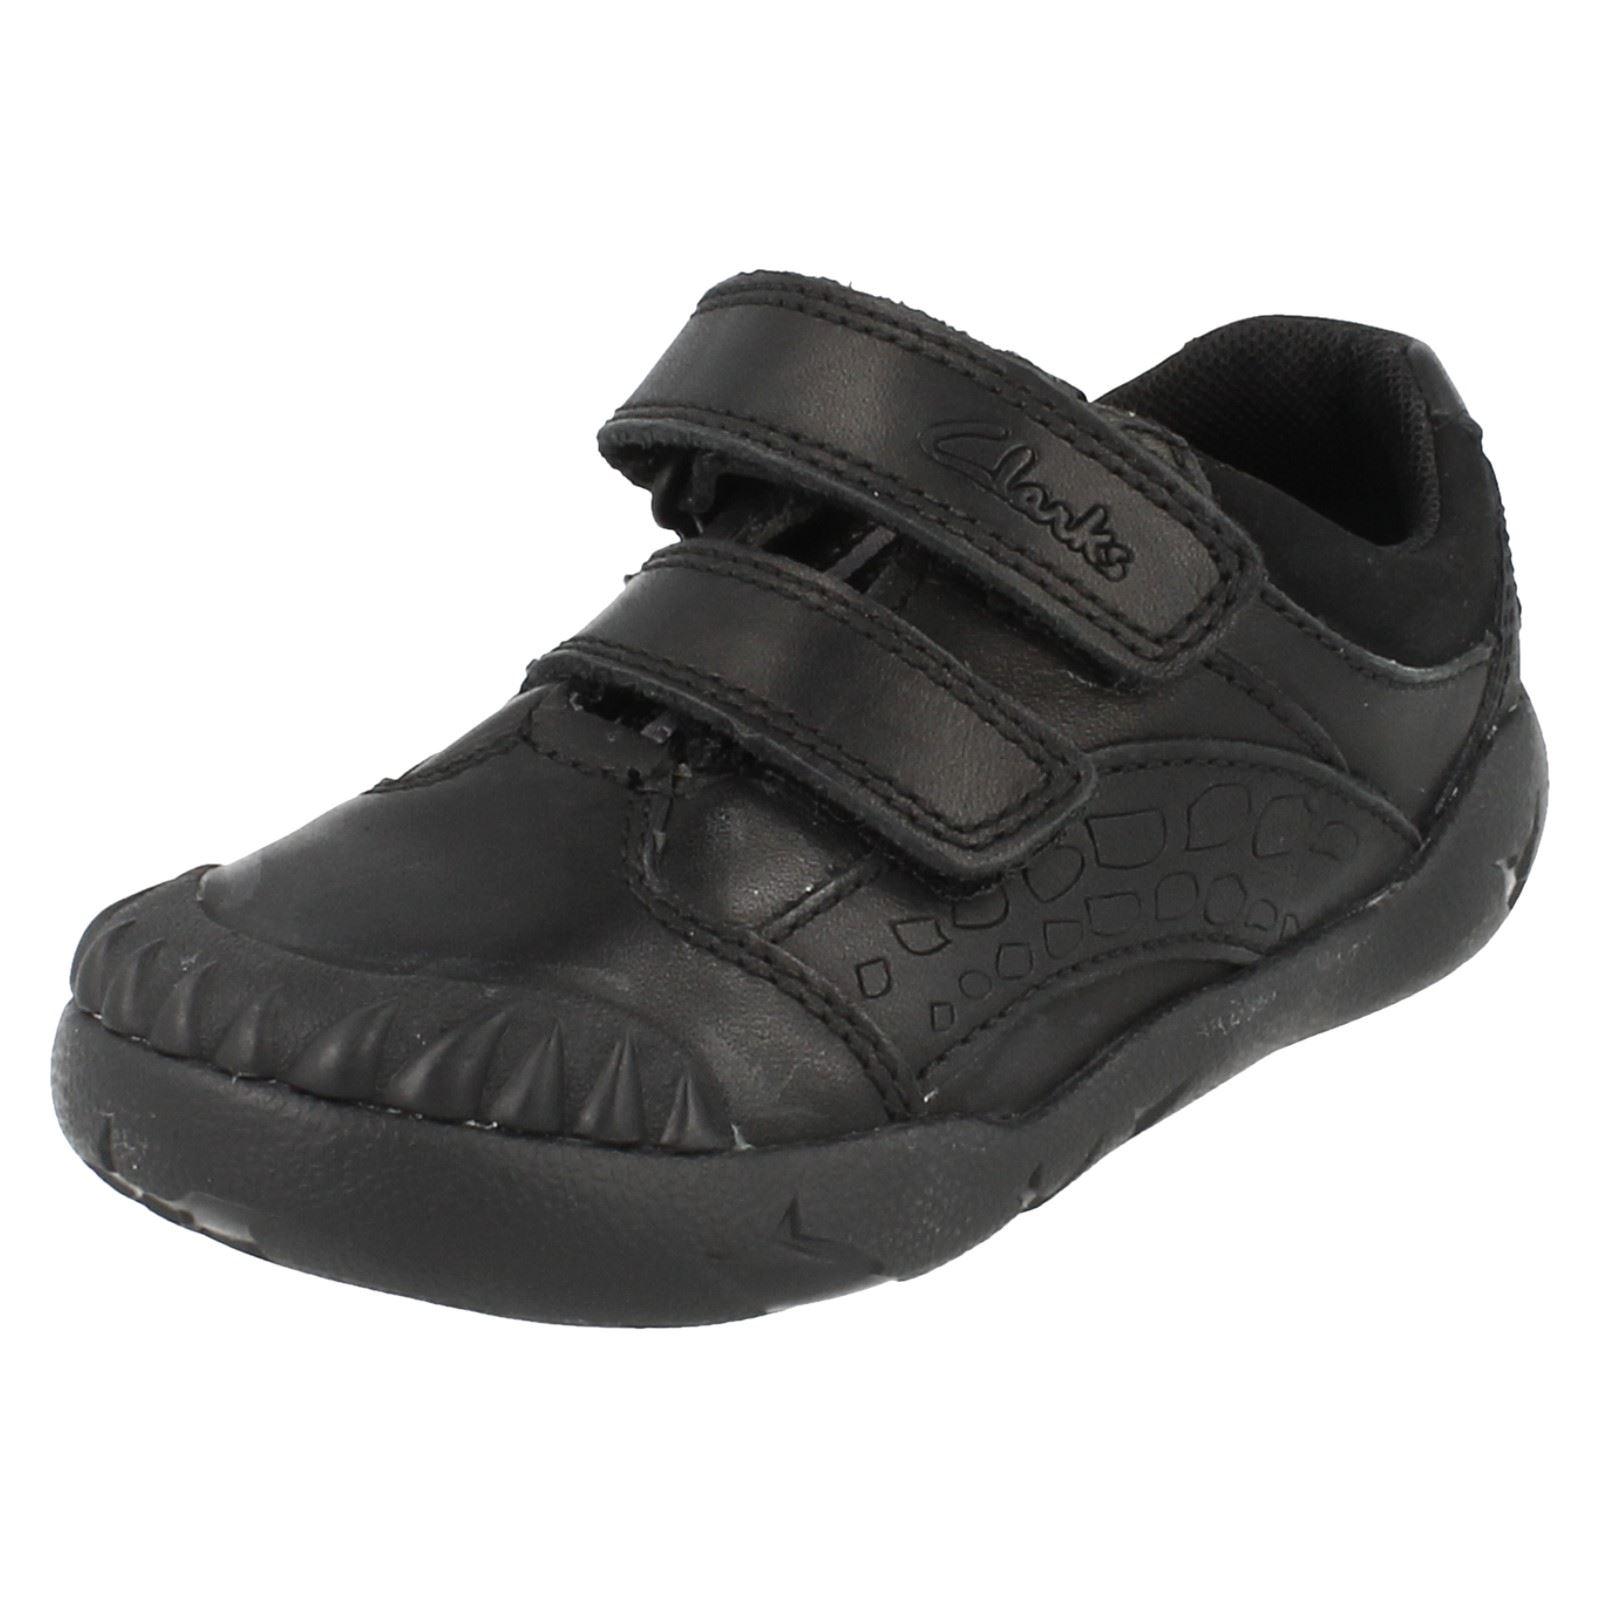 Boys Clarks School Shoes 'Rapto Boy'   eBay